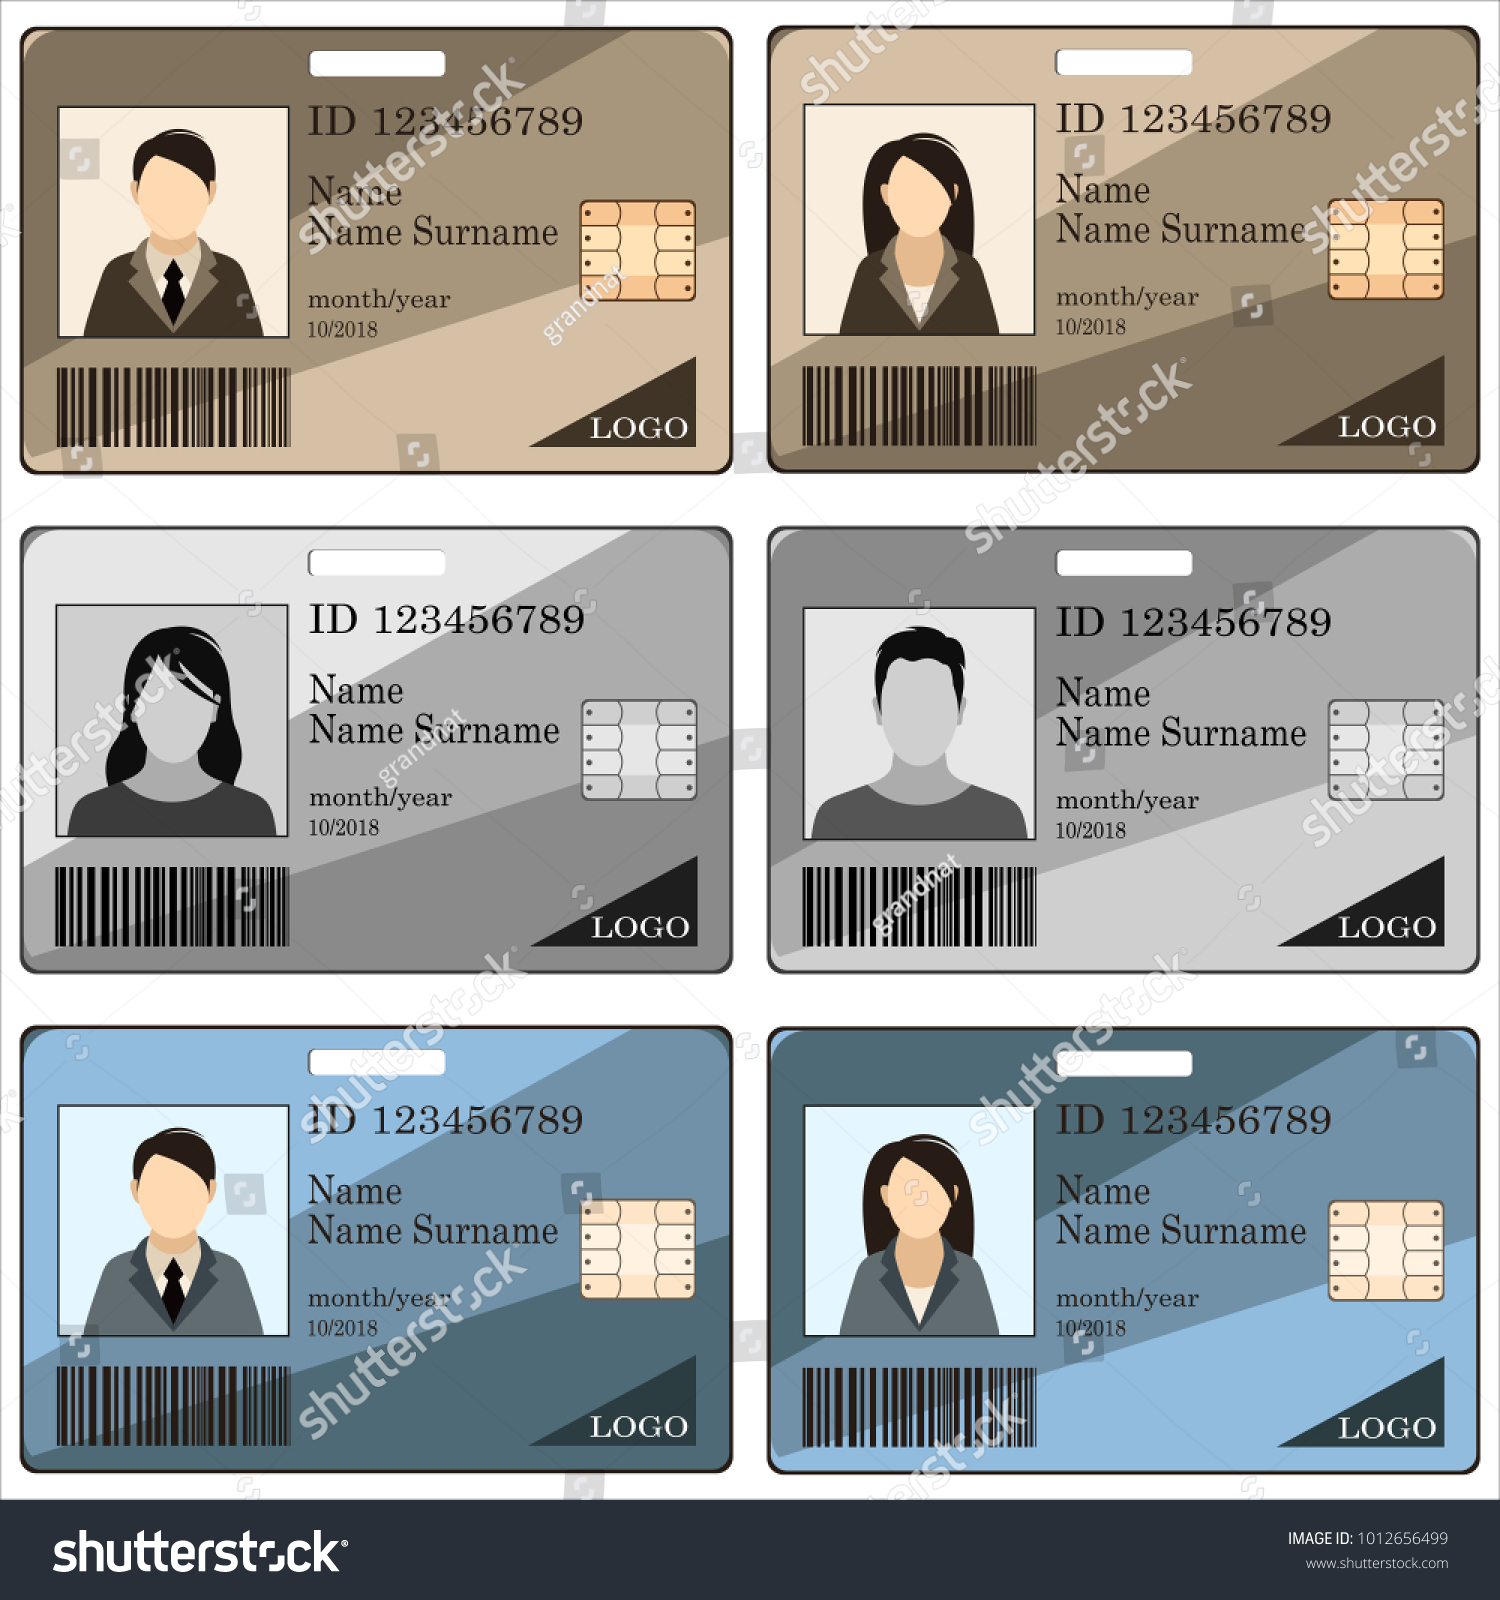 Templates ID Cards Badges Men Women Stock Vector 1012656499 ...